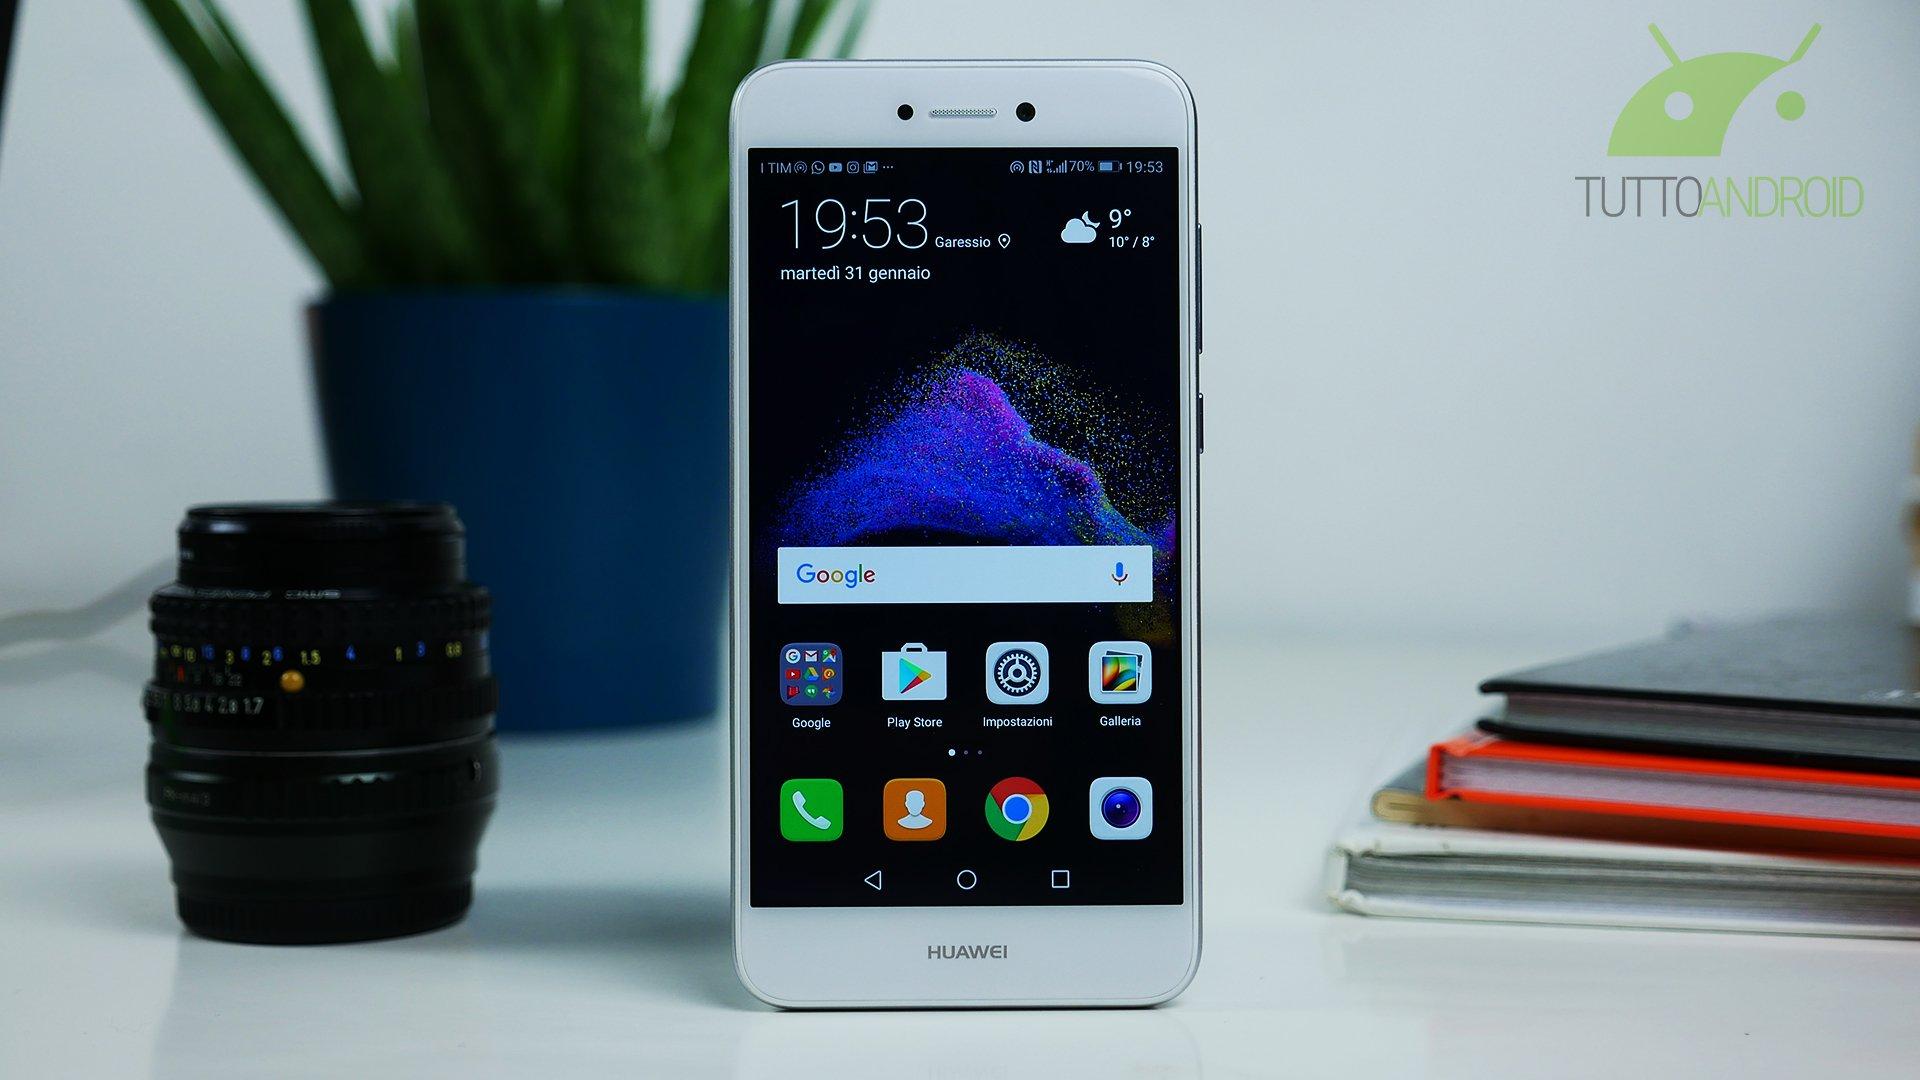 Recensione Huawei P8 Lite 2017 Riuscirà A Ripetersi Tuttoandroid